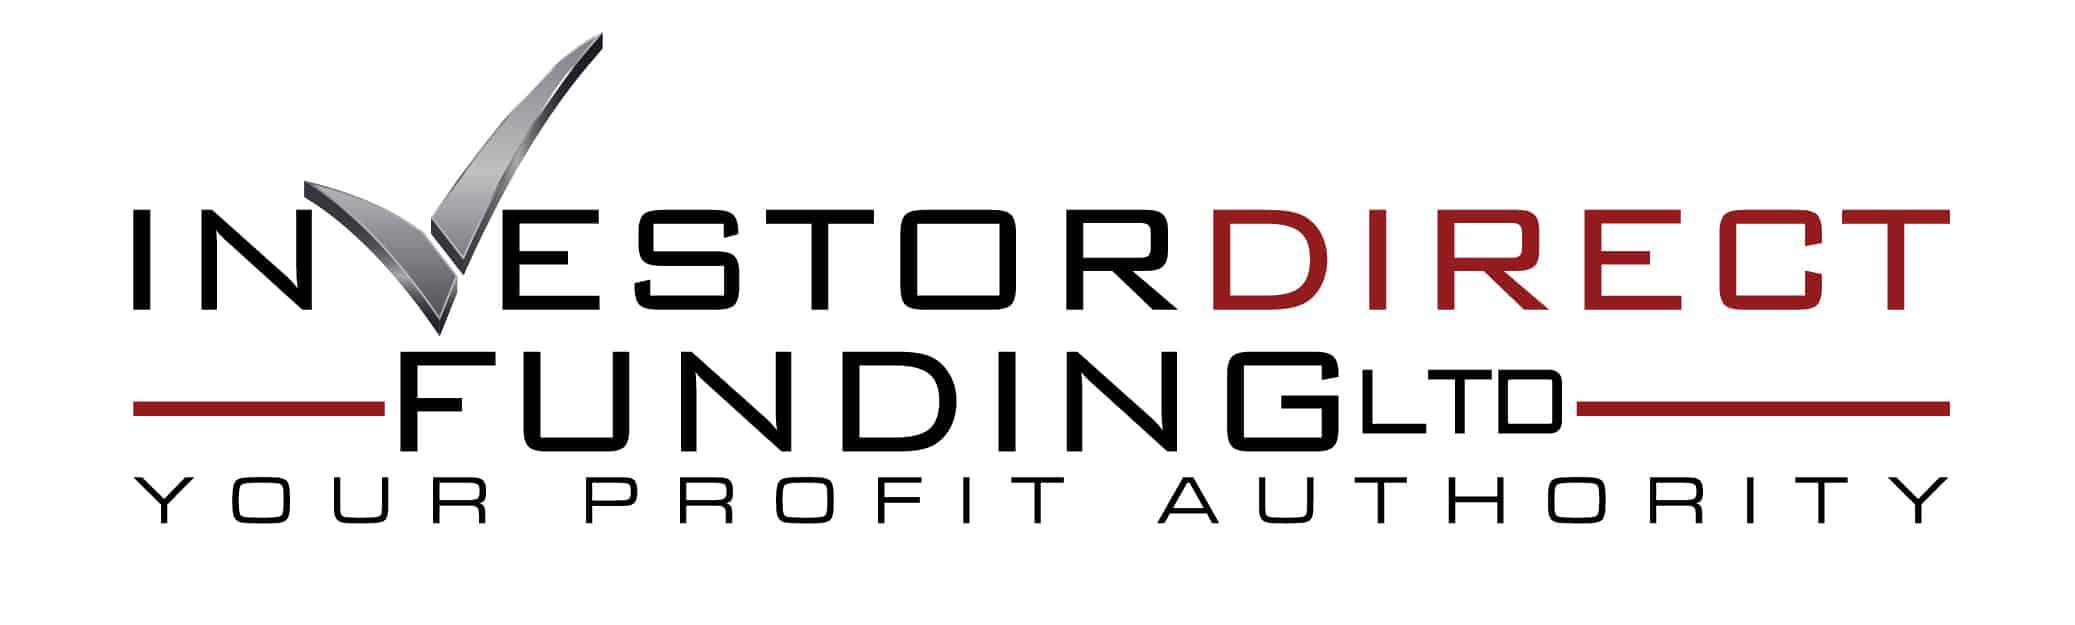 Invester direct funding final logo LTD